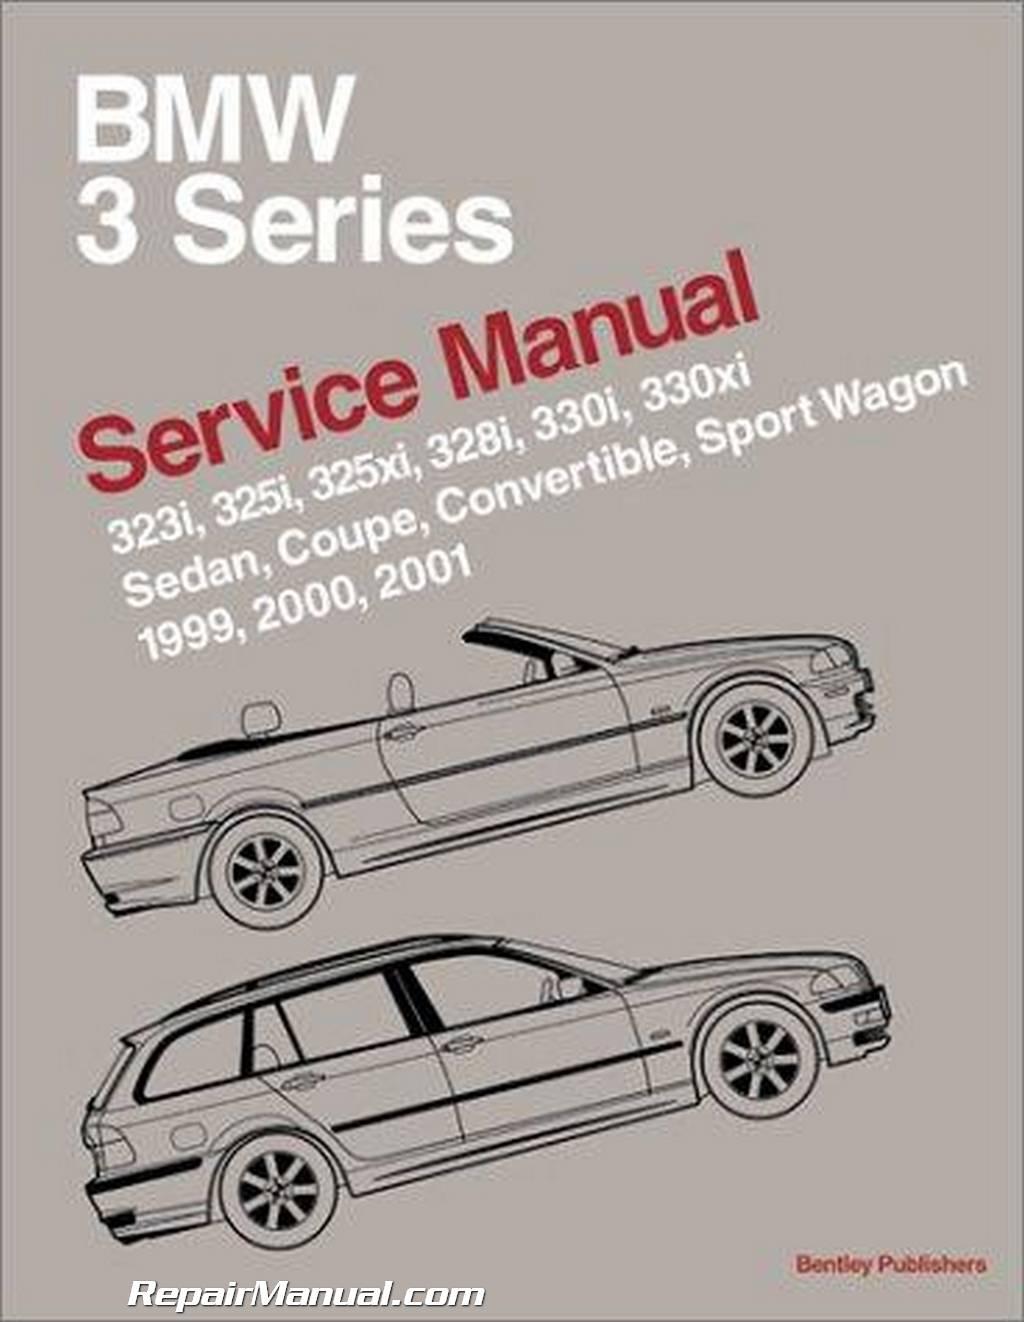 bmw 3 series e46 service manual 1999 2001 rh repairmanual com 2014 BMW 3 Series Electrical Troubleshooting Manual BMW E21